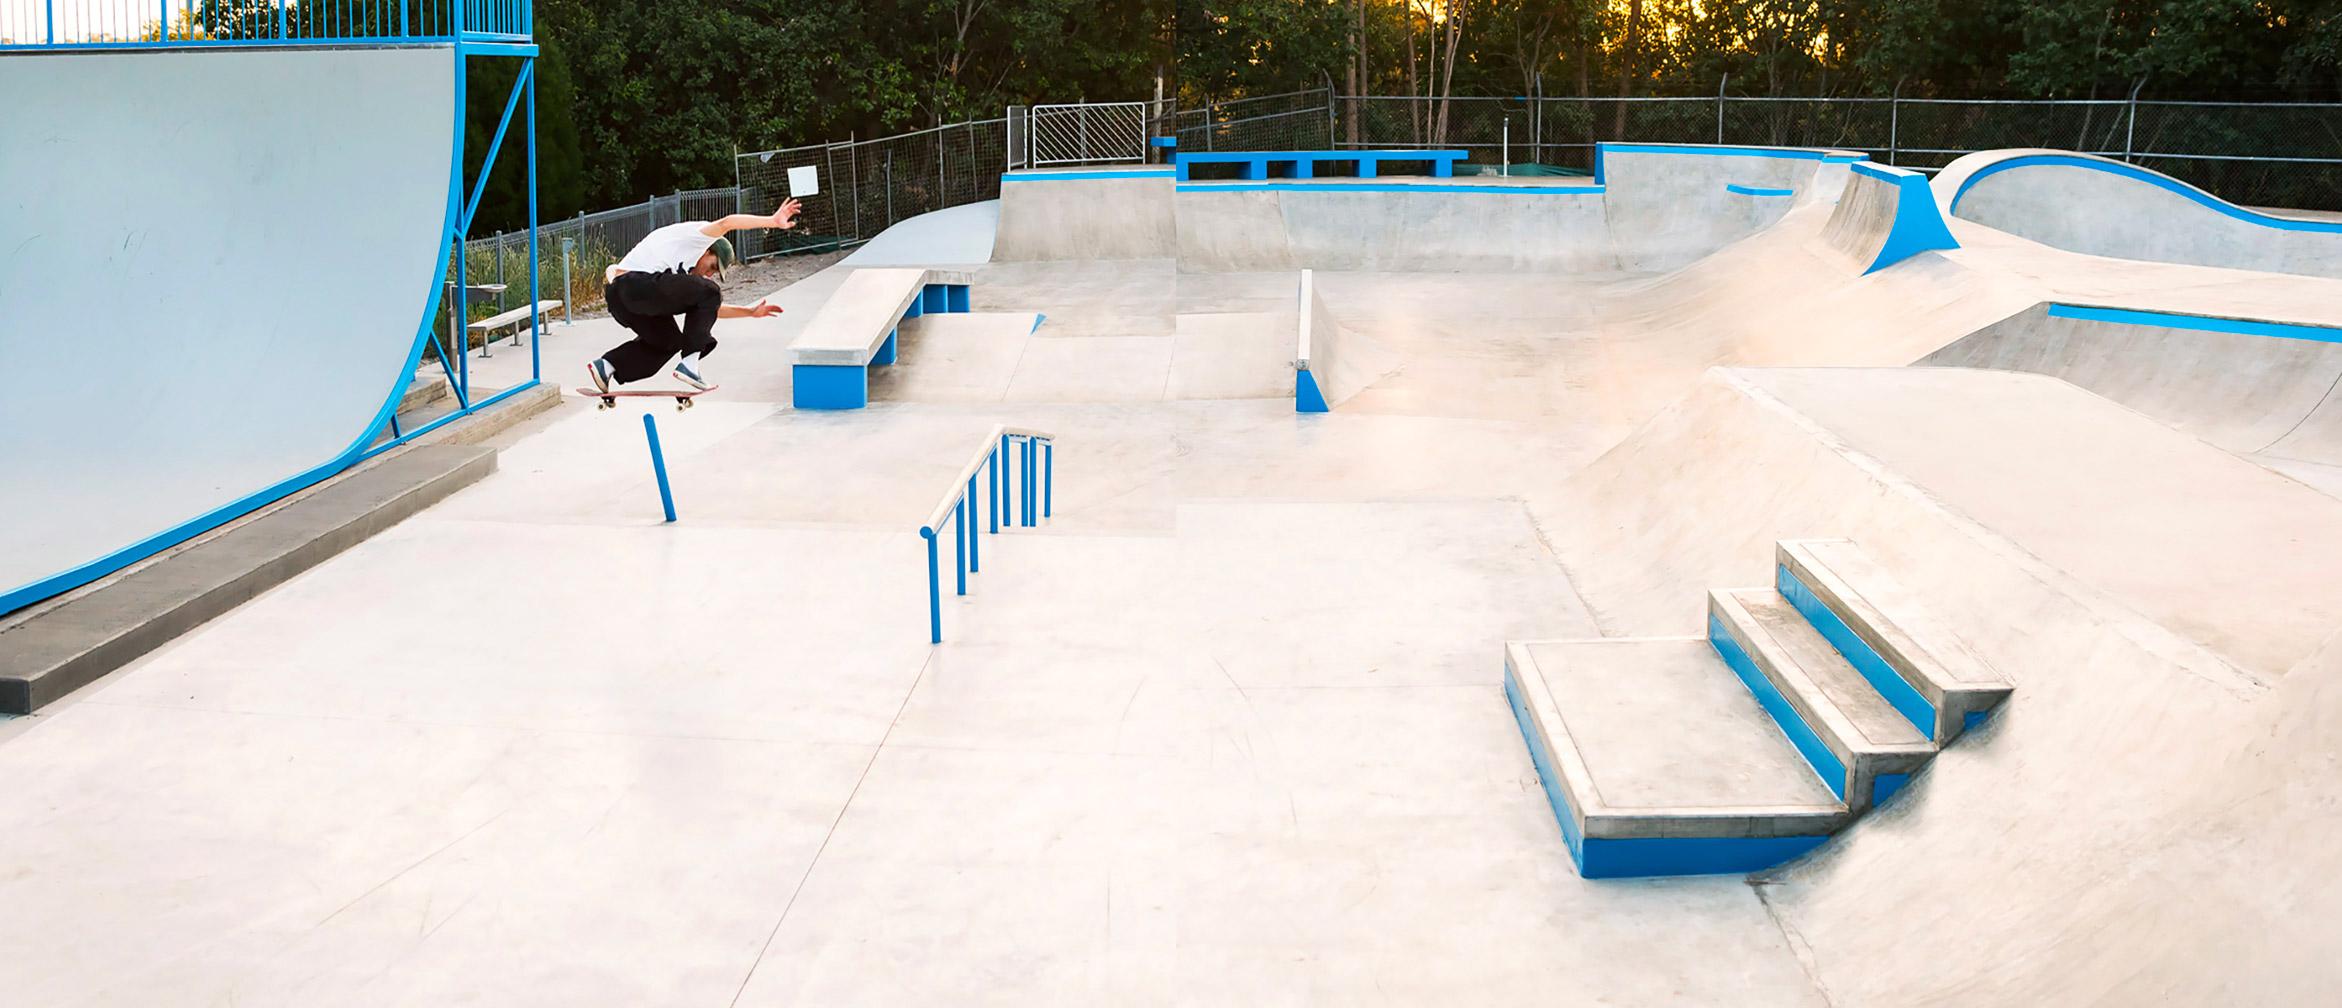 Matthew Boggis pole jam bs lip at Sunshine Beach skate park